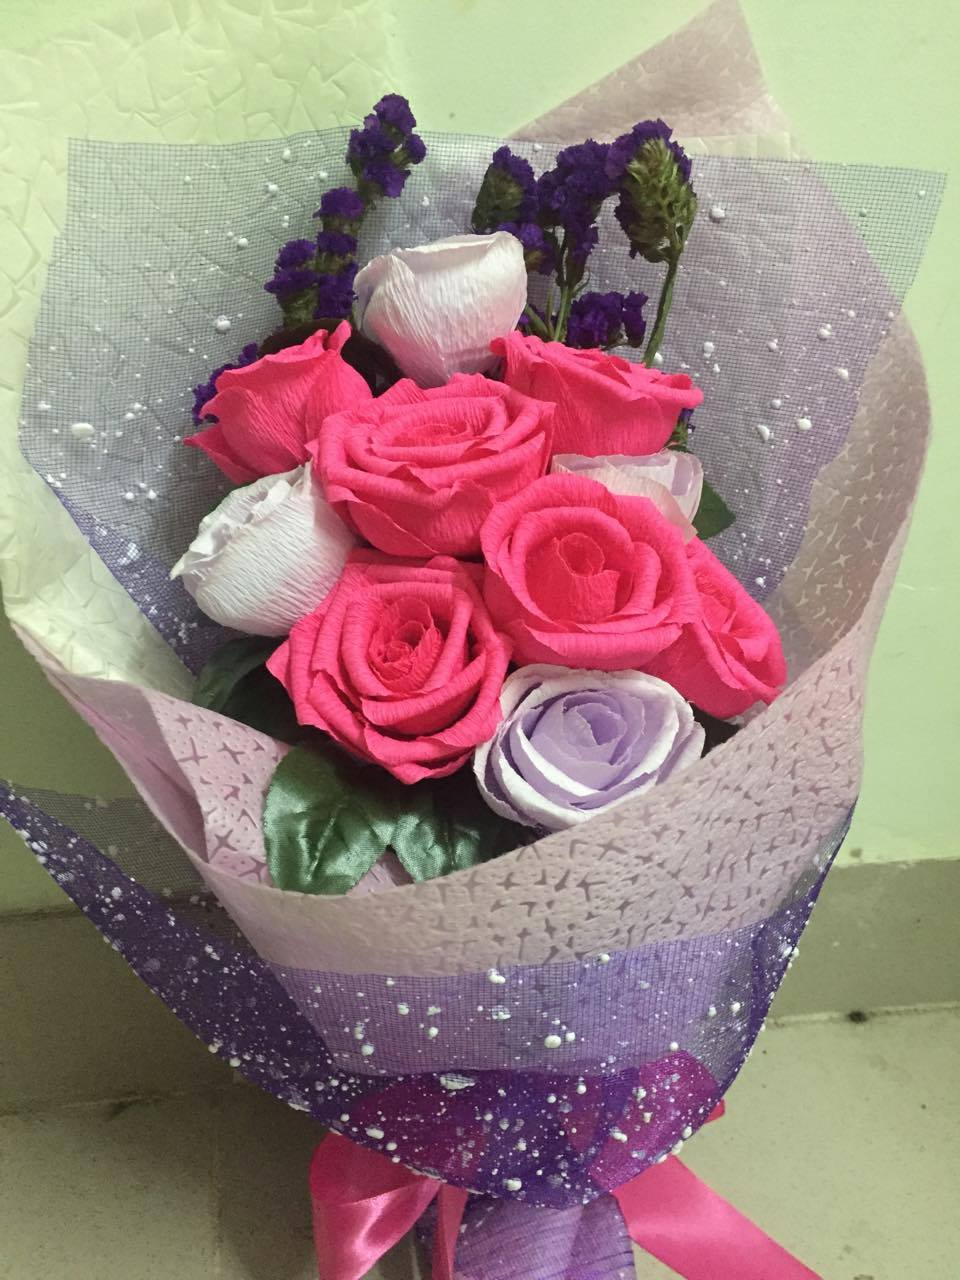 Kiệt tác Hoa hồng Handmade